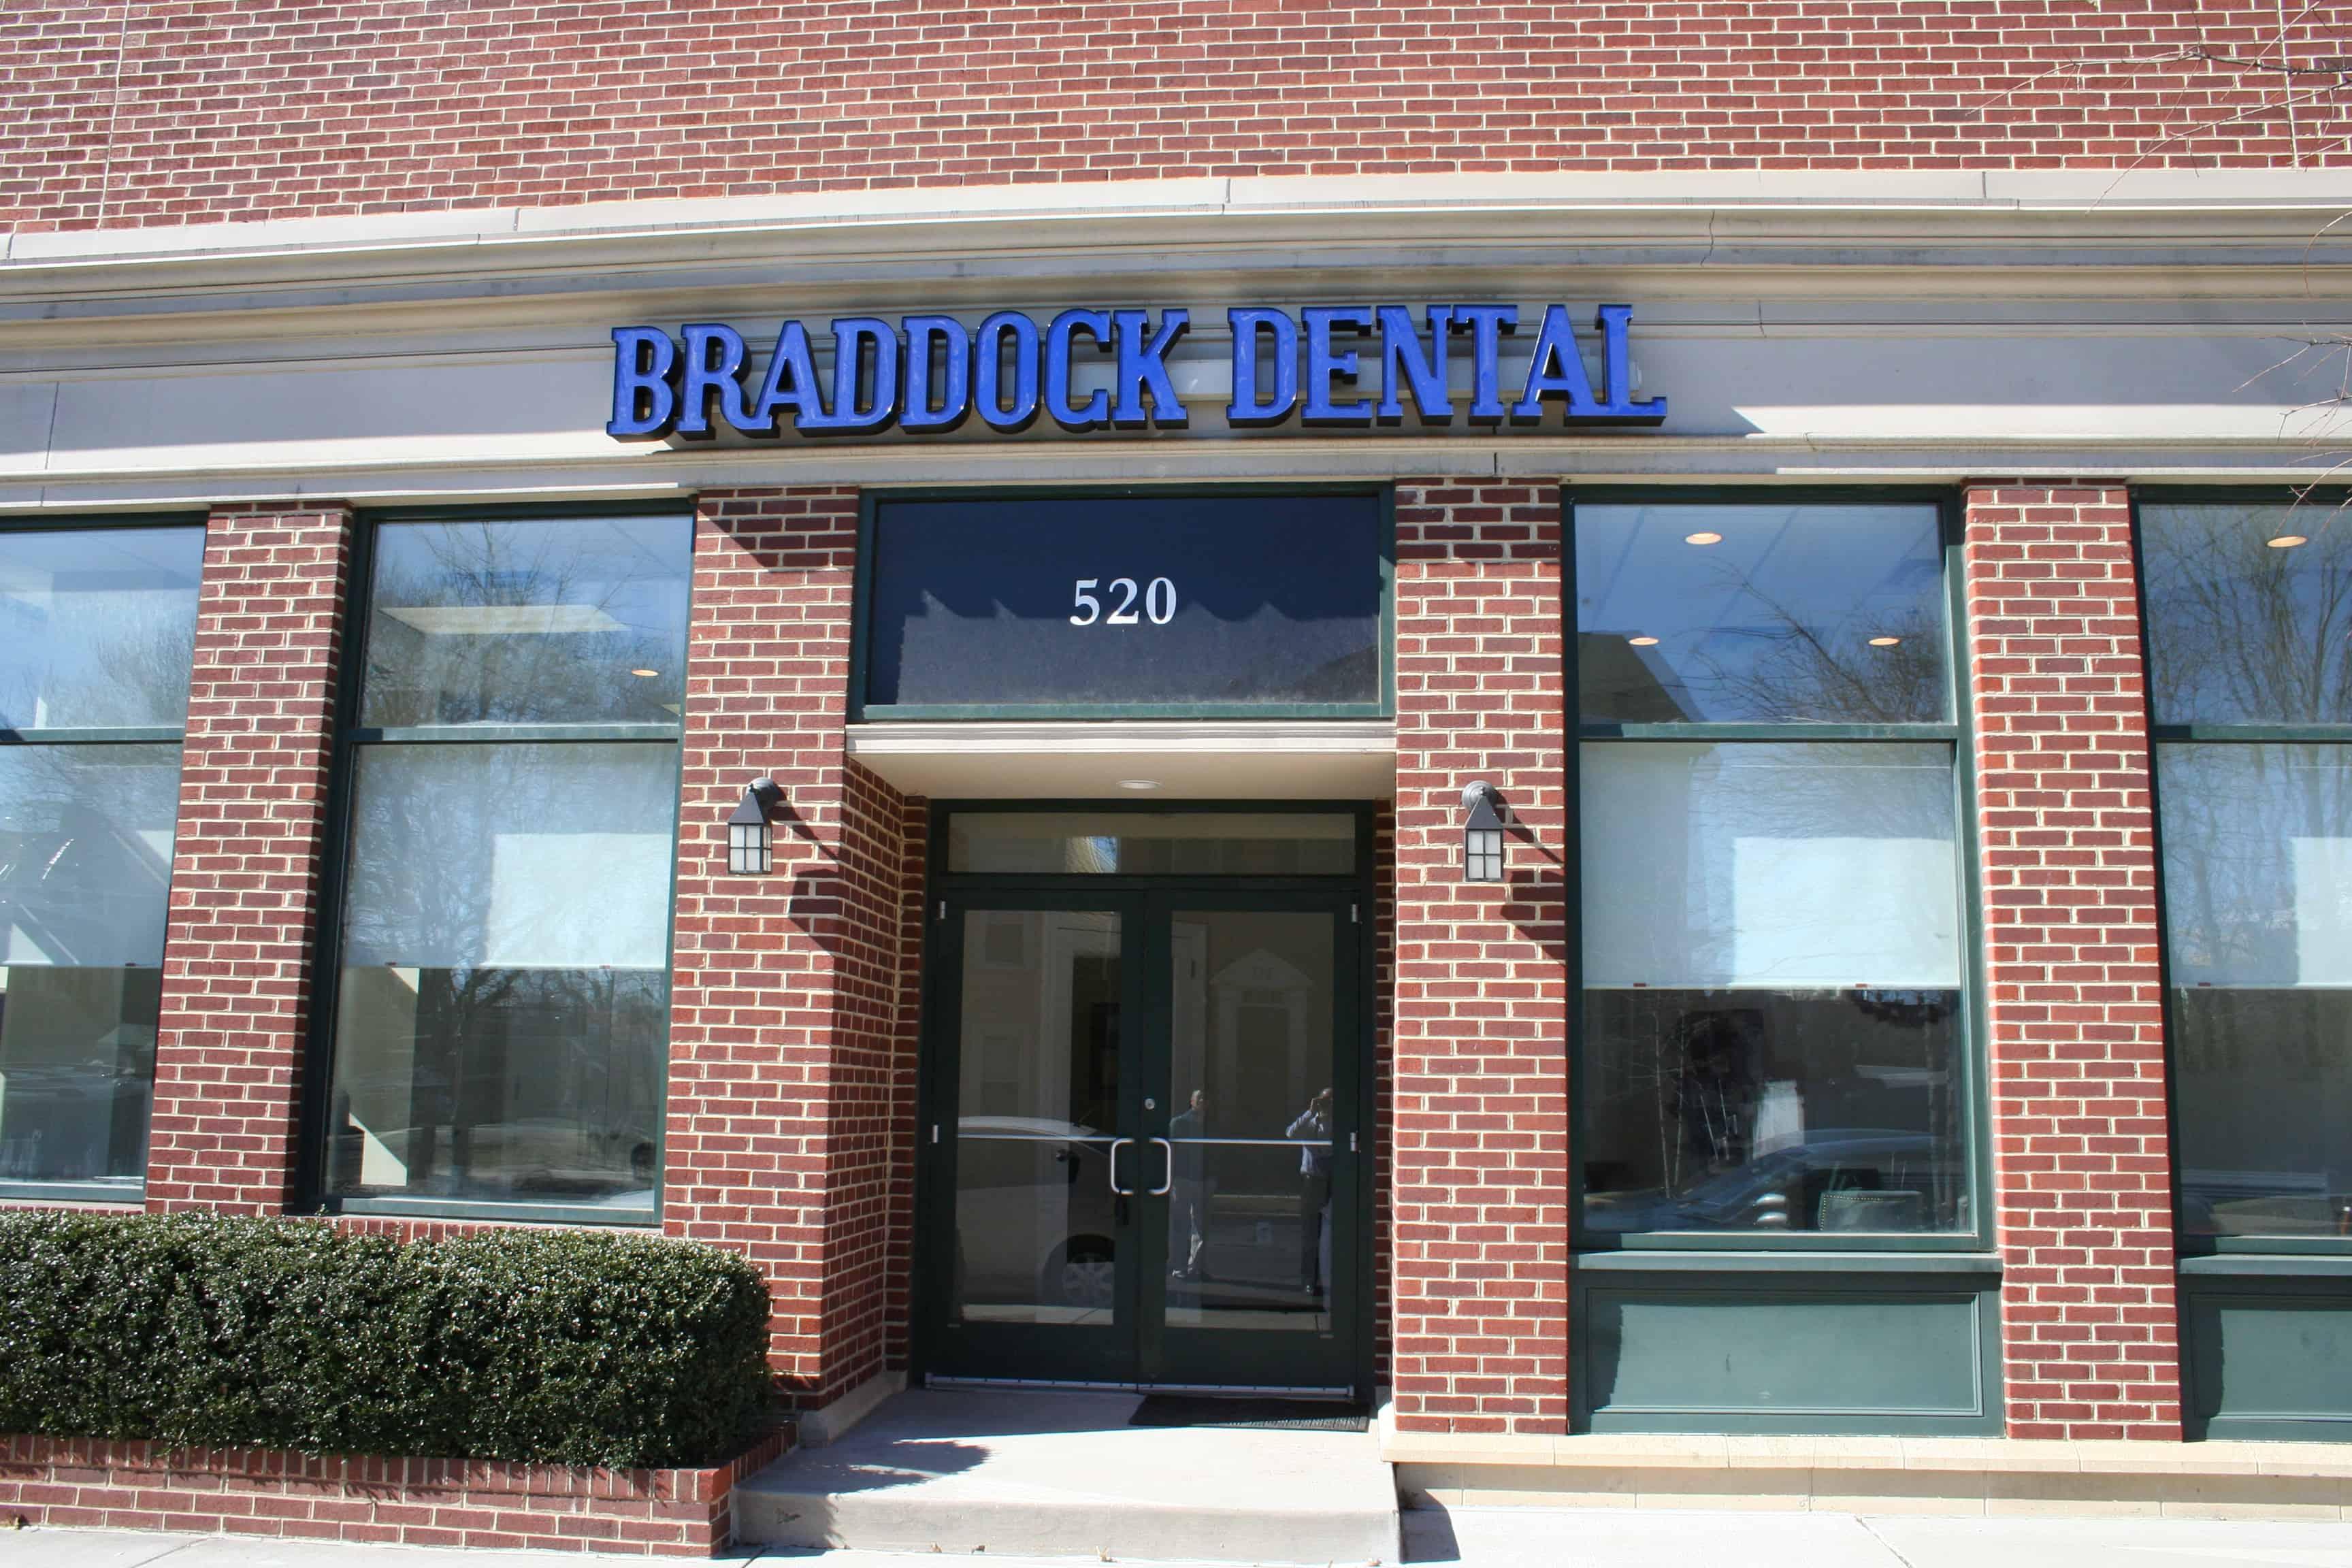 About Braddock Dental